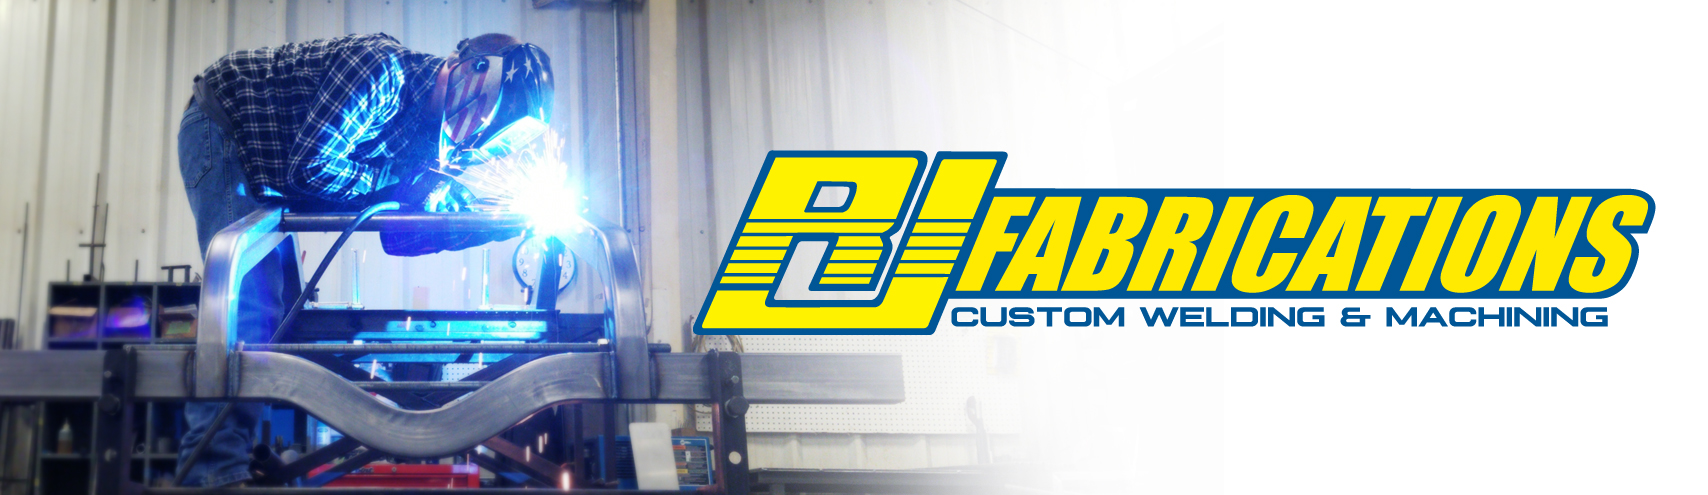 rj-fabrications-main-banner.jpg